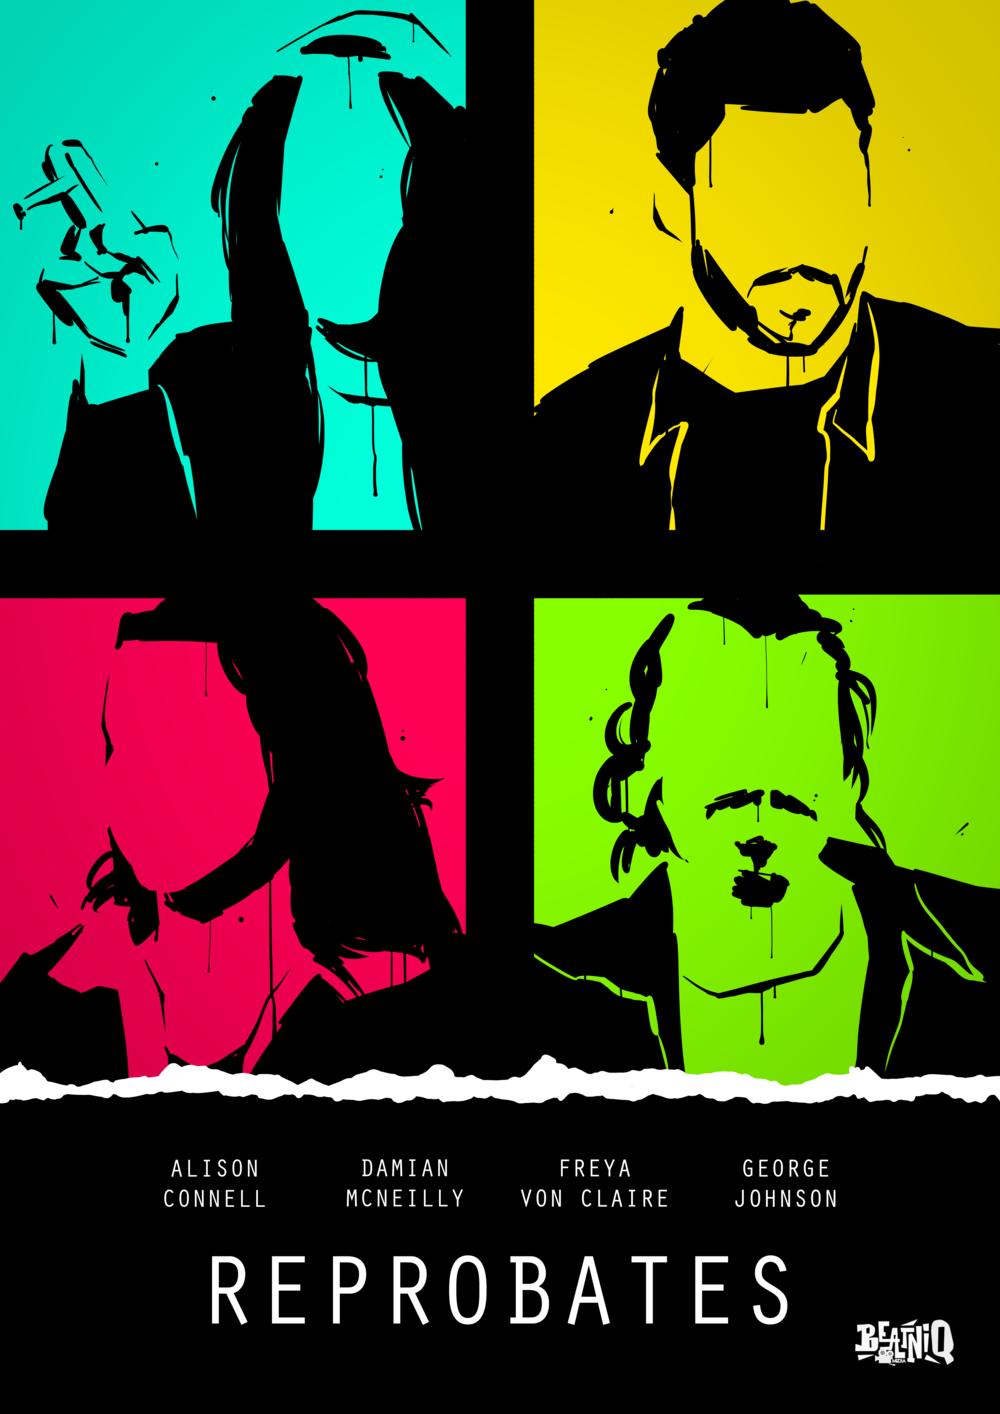 Reprobates A3 poster